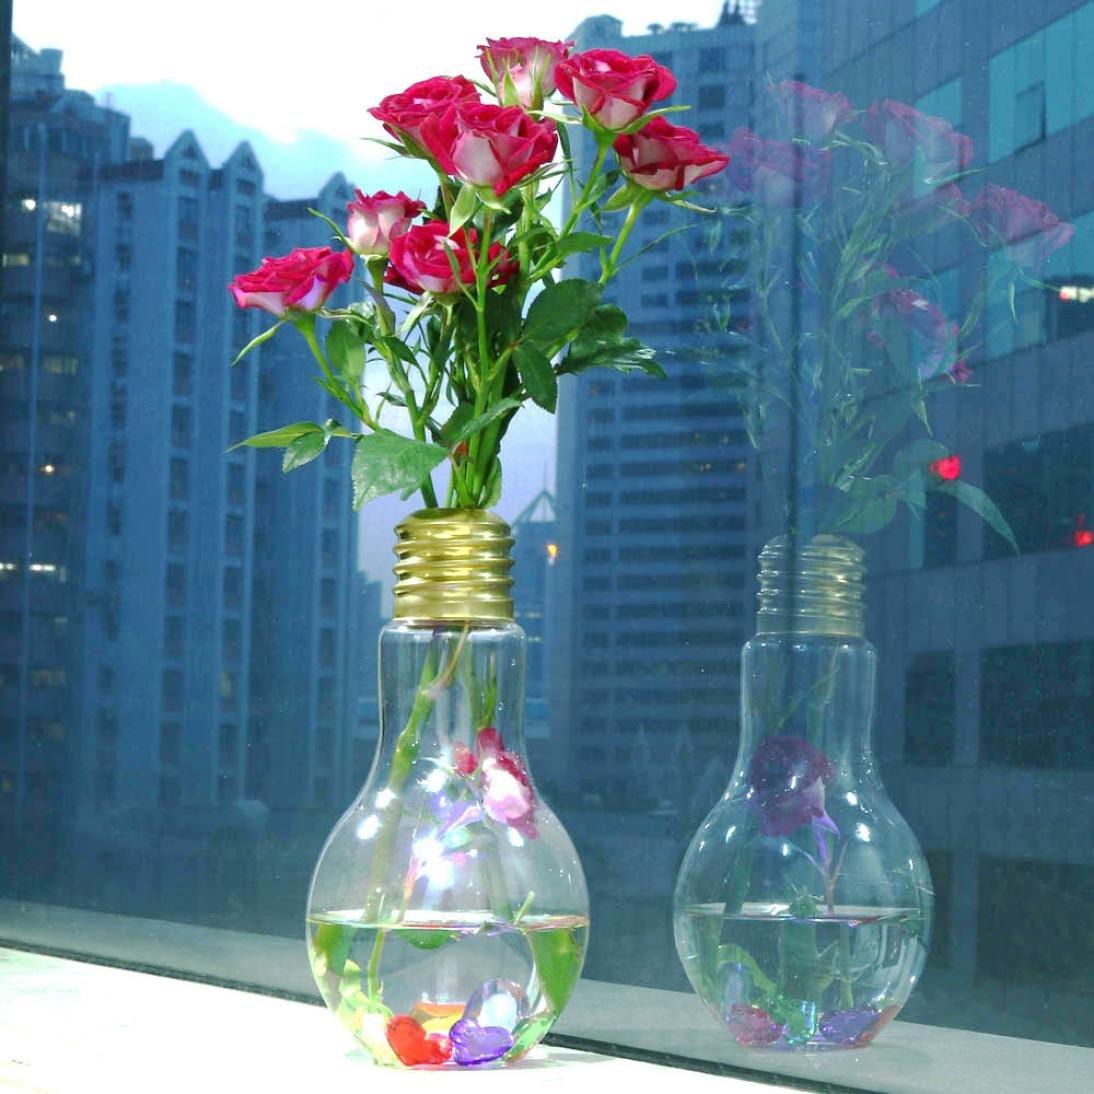 Transer Glowing Light Bulb Shape Stand Plant Flower Vase (Gold) by Transer (Image #5)